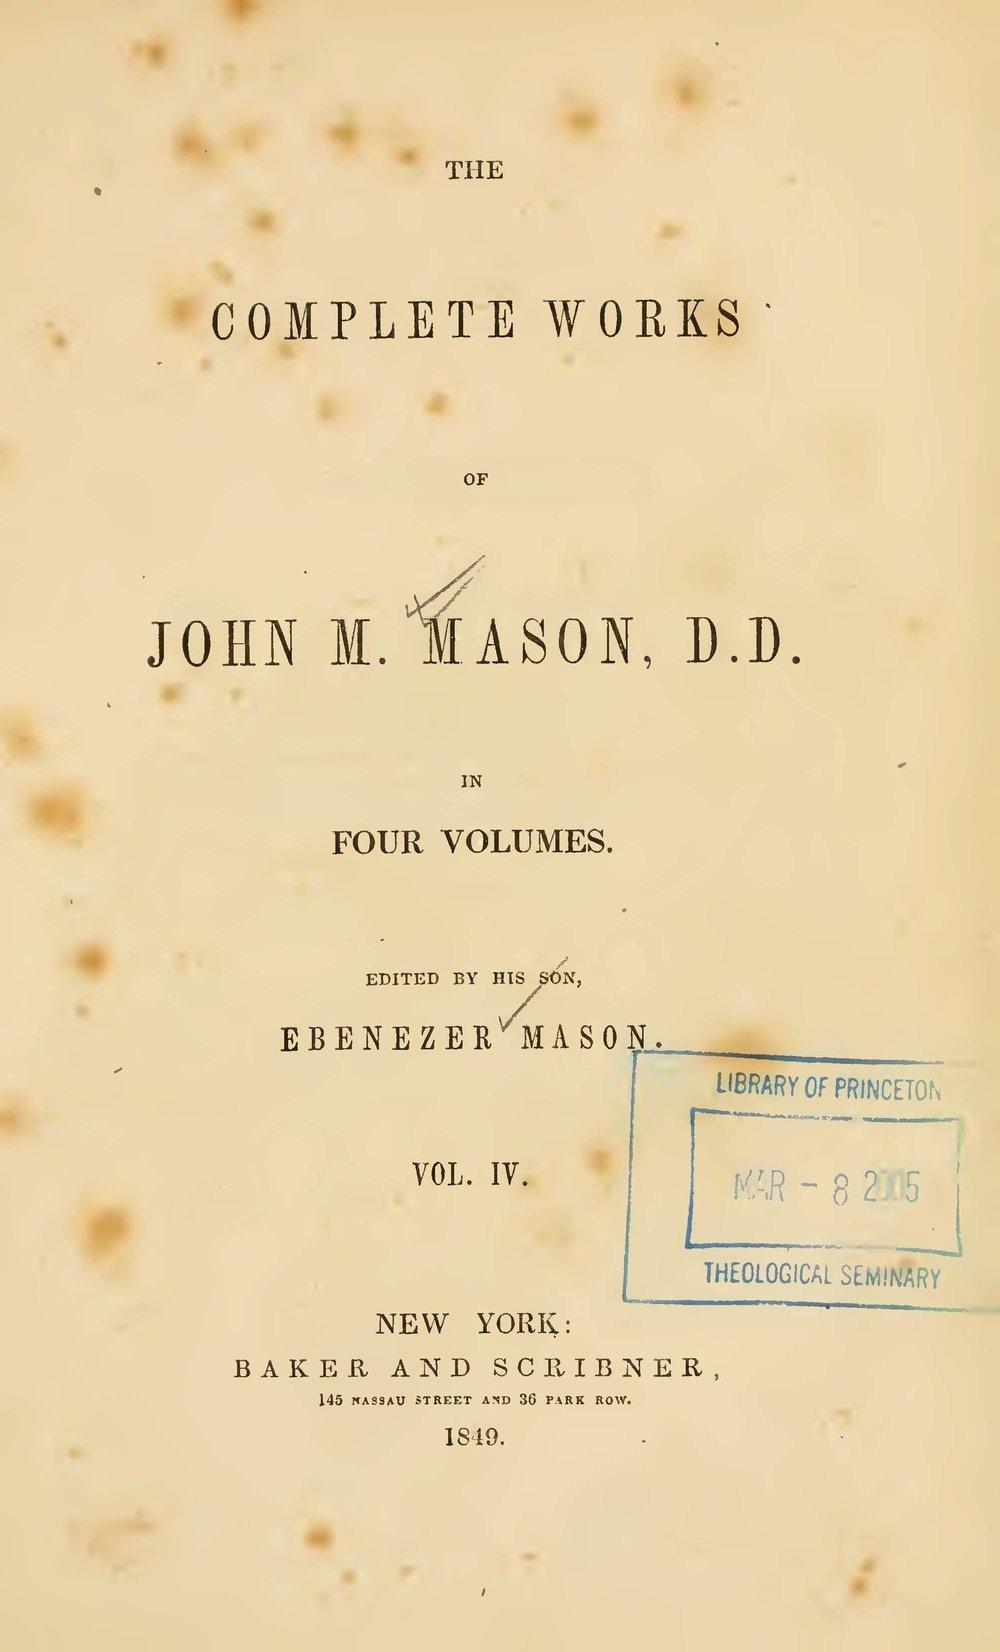 Mason, John Mitchell, The Complete Works of John M. Mason, D.D., Vol. 4 Title Page.jpg